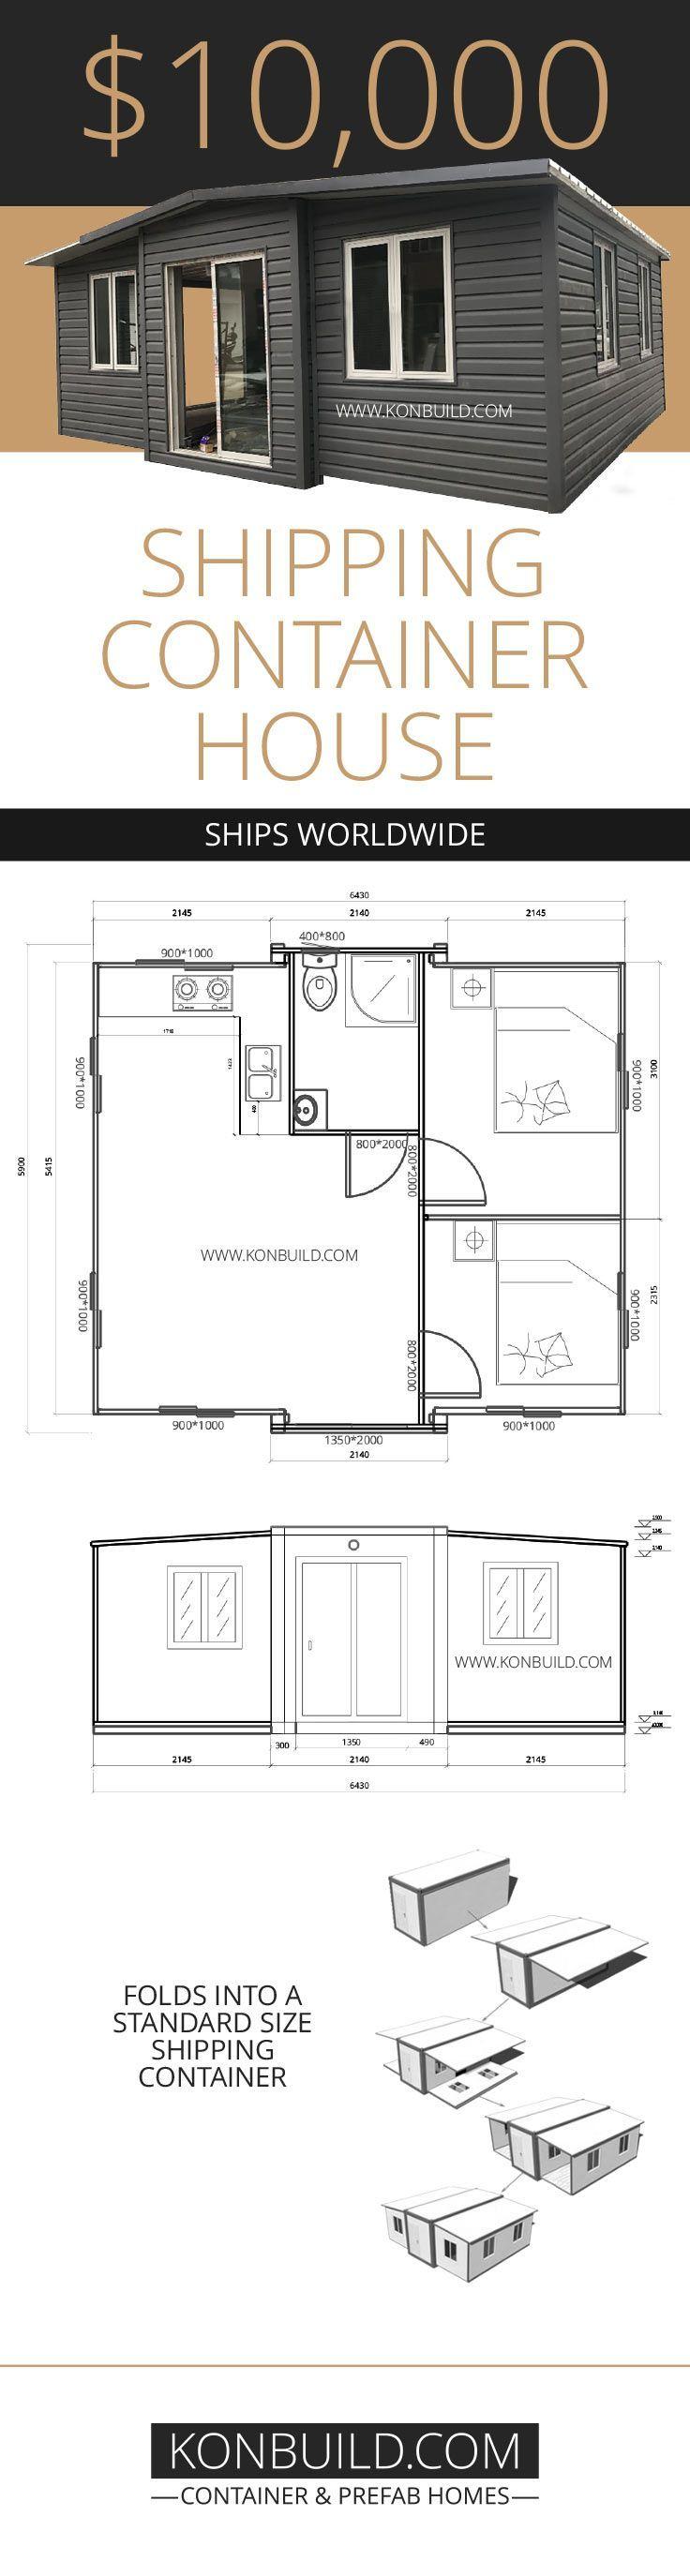 Shipping Container Underground Bunker Plans Best Kitchen Gallery ...